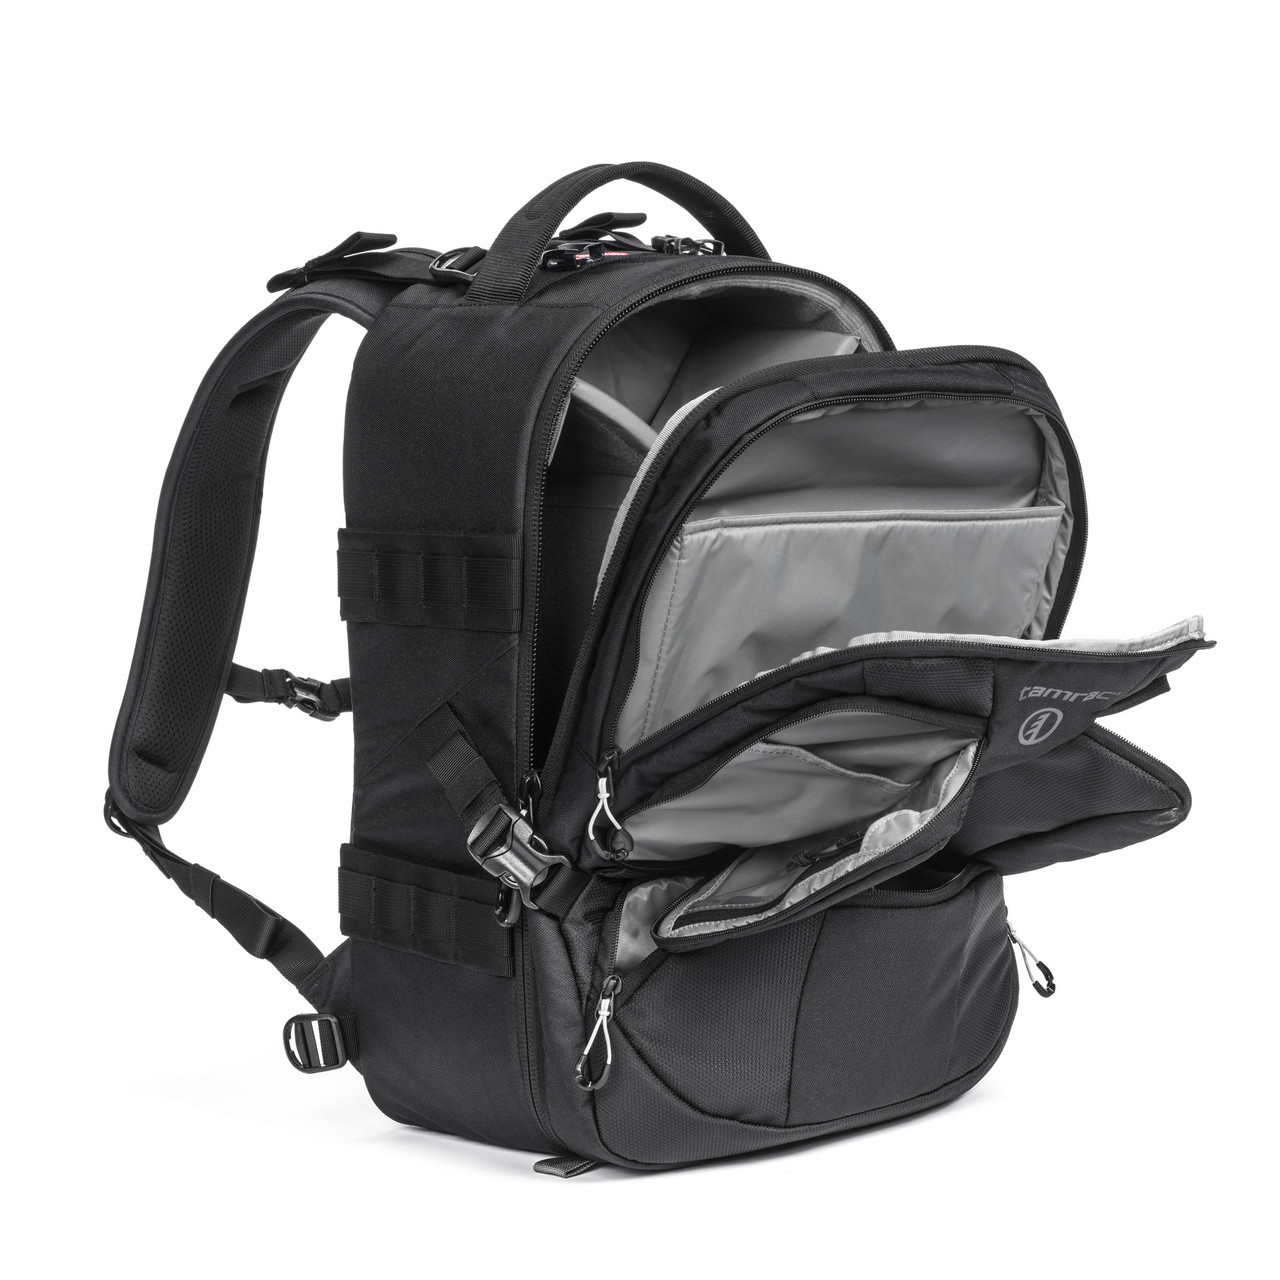 aedc6e180f4 Tamrac Anvil 23 Pro Camera Backpack - Opened. Loading zoom